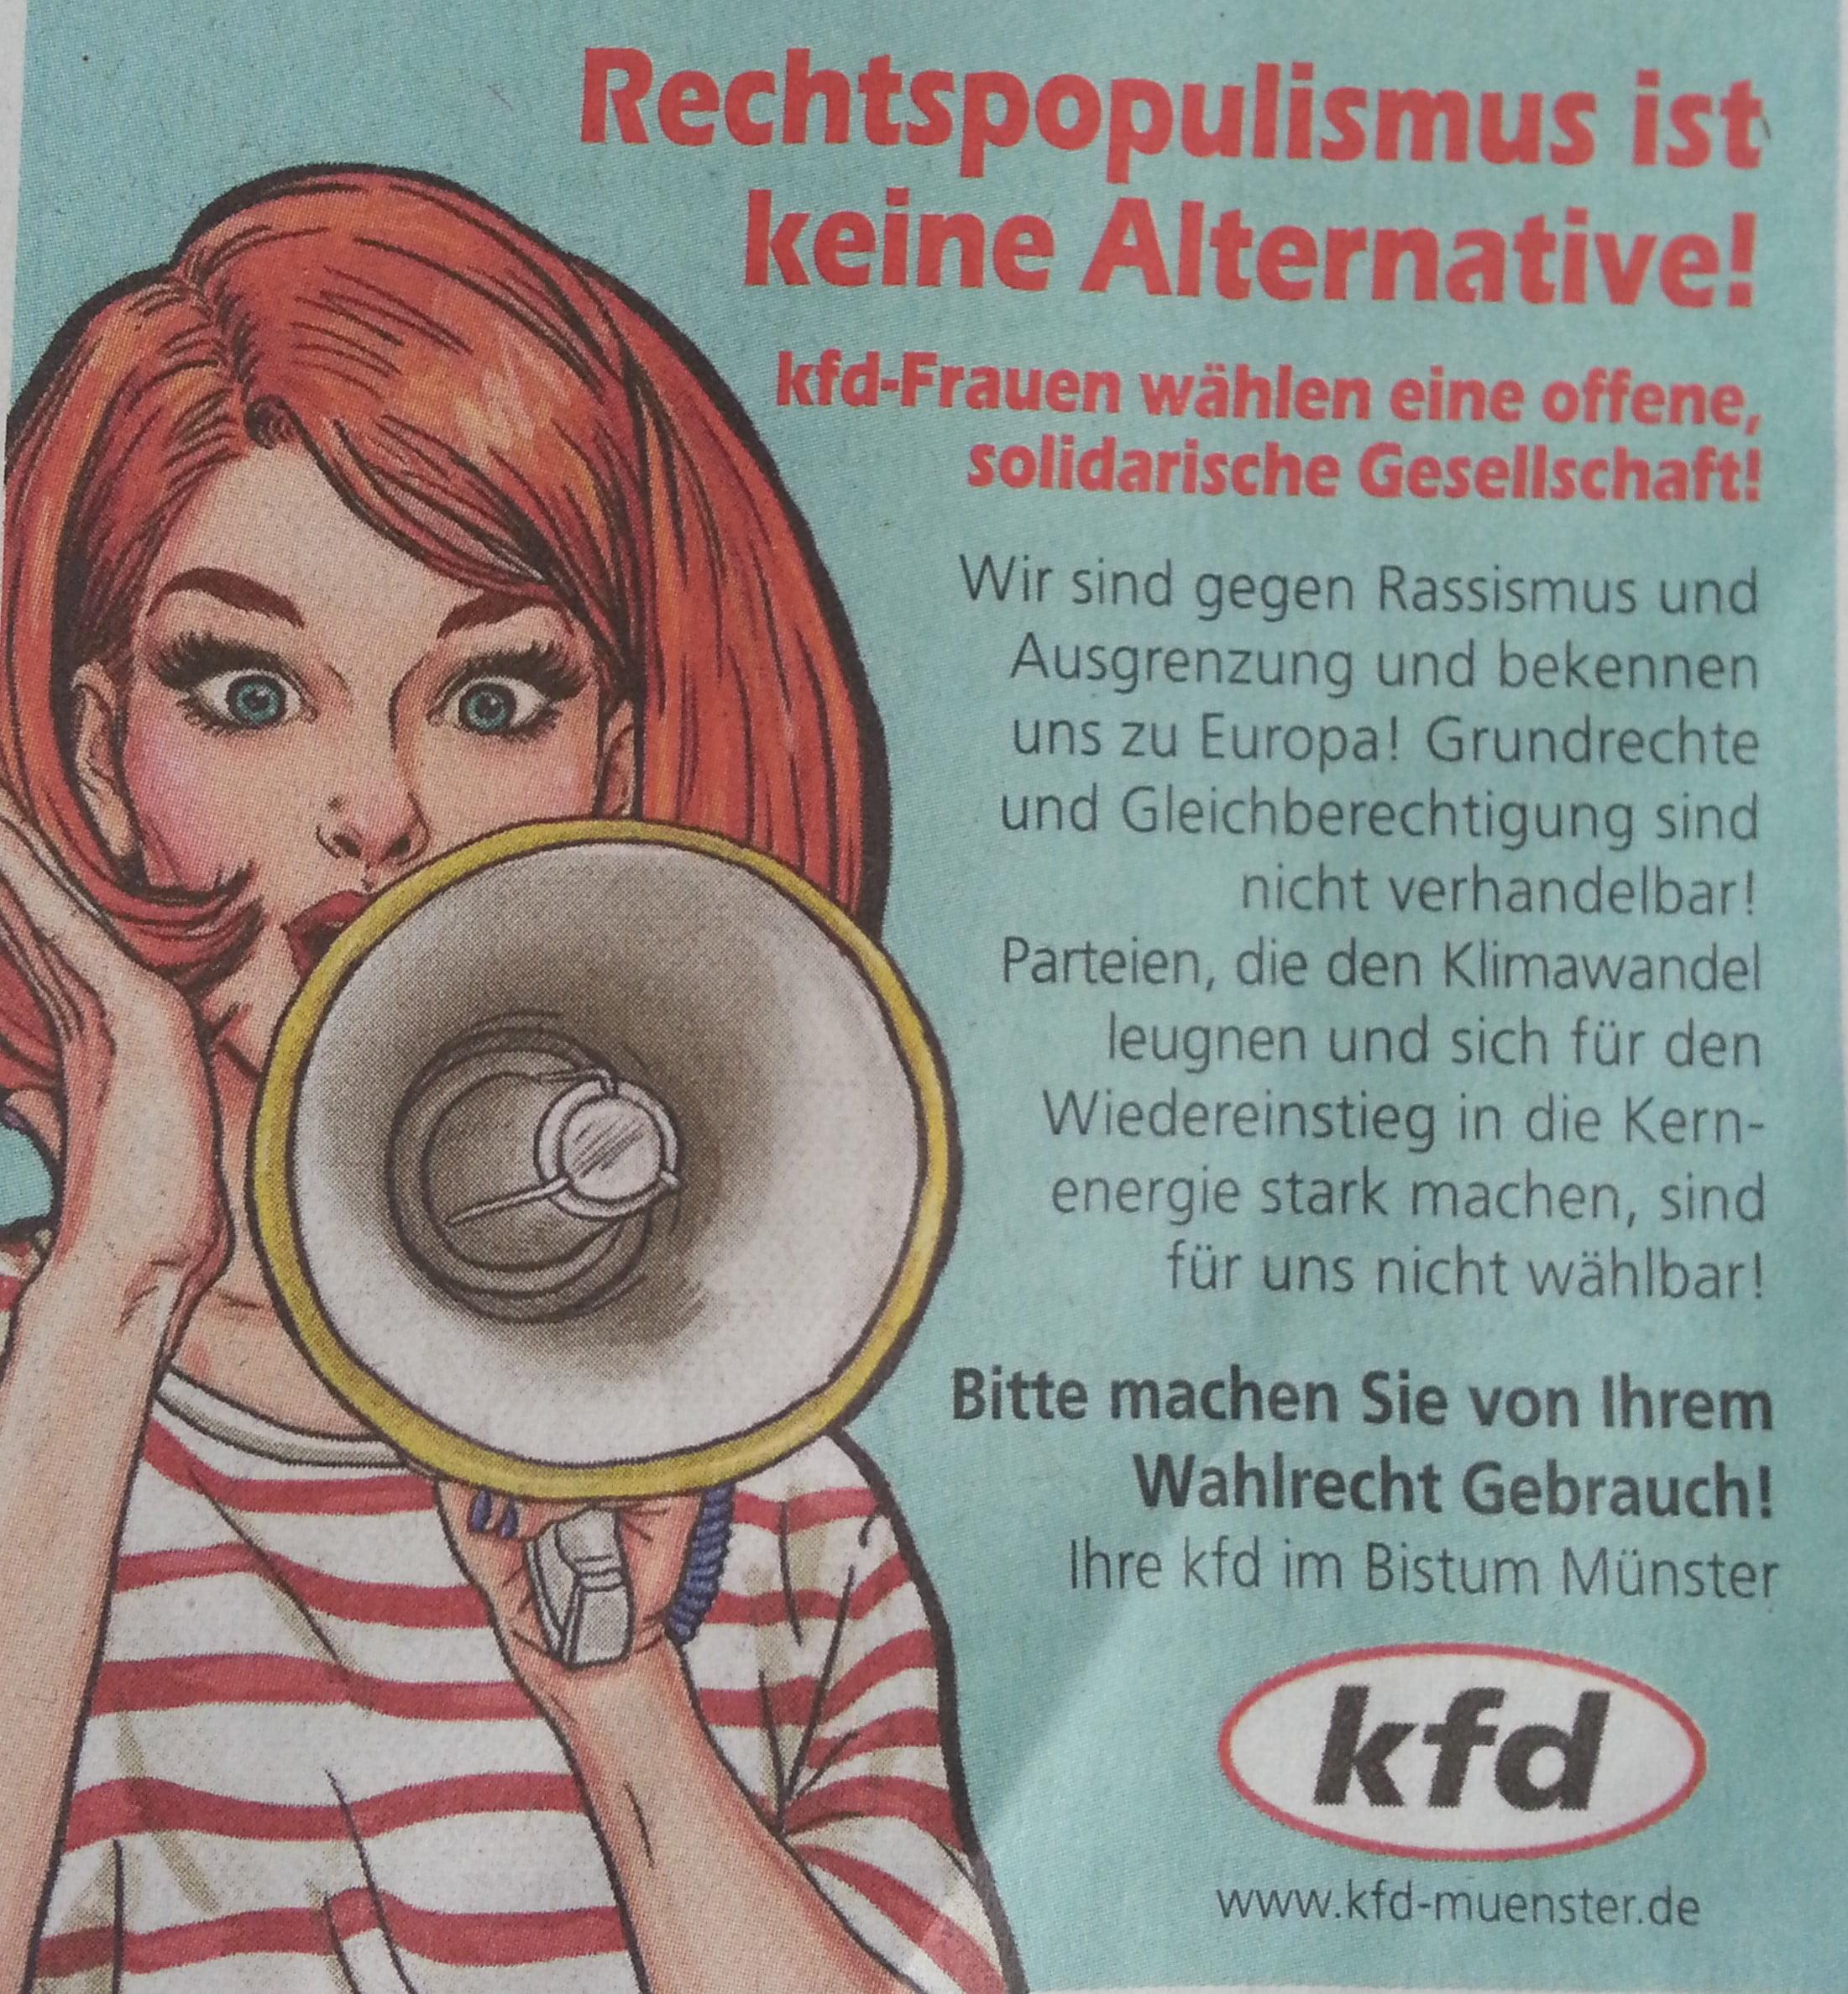 kfd-Anzeige